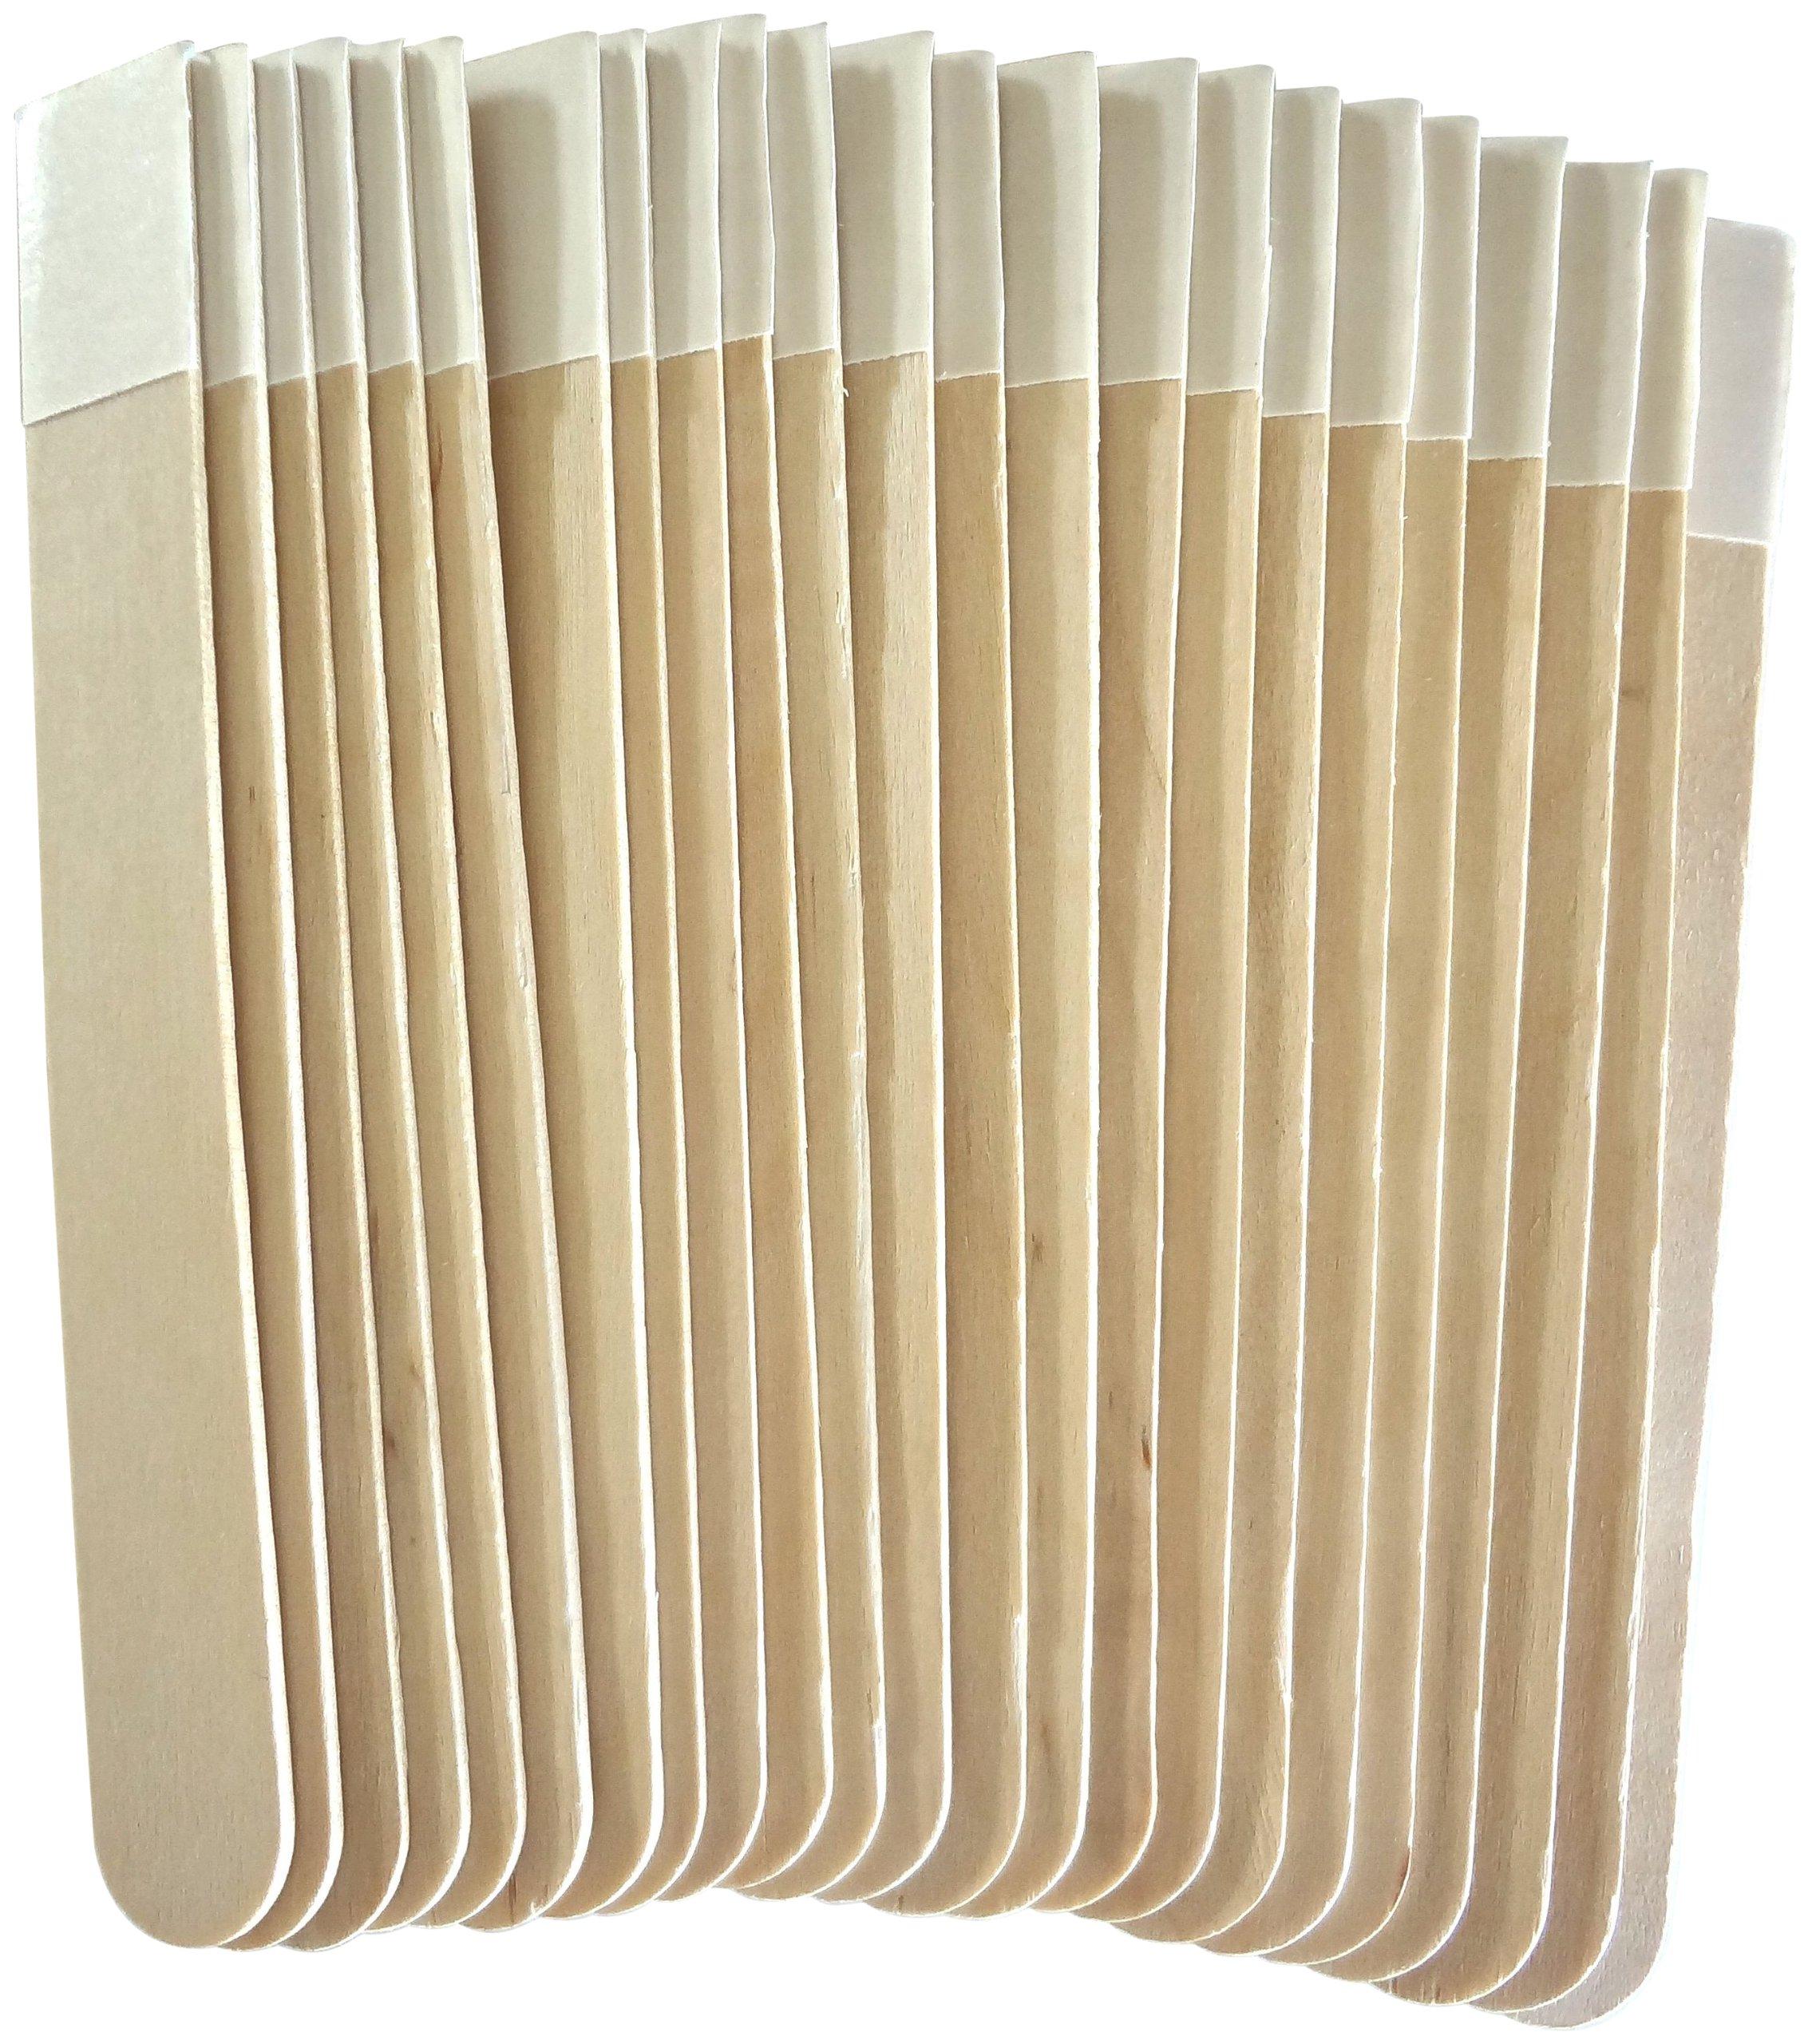 Sticky Sticks 500 Count Self Adhesive Craft Stick Bulk Box